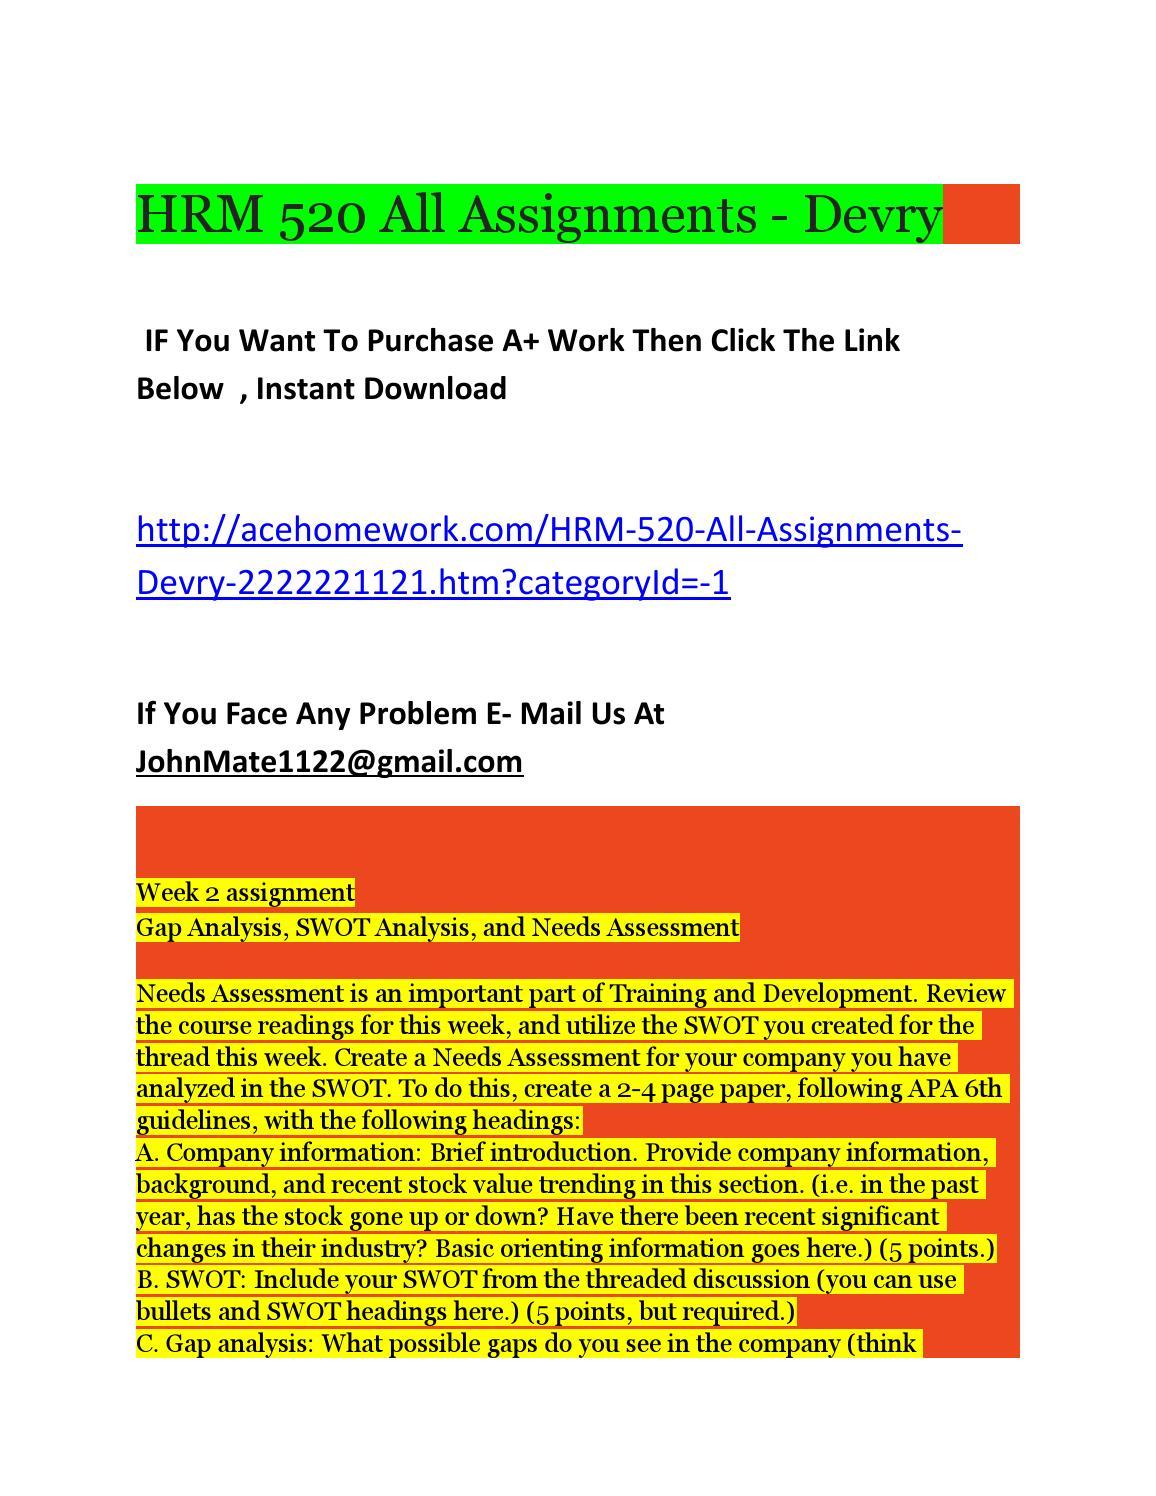 HRM 520 Assignment 4 e-Recruiting